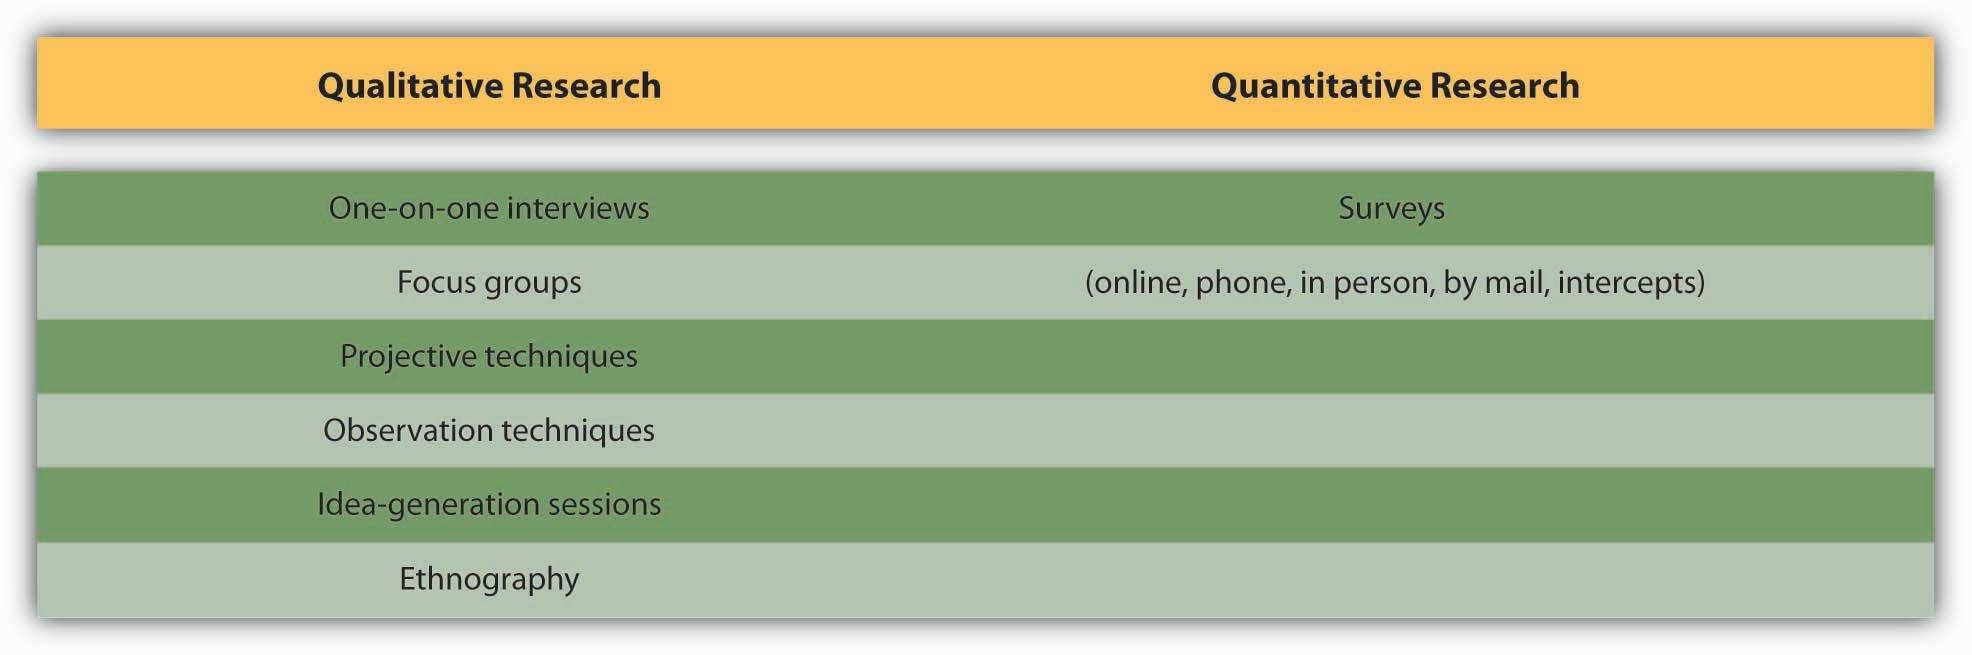 qualitative descriptive research design